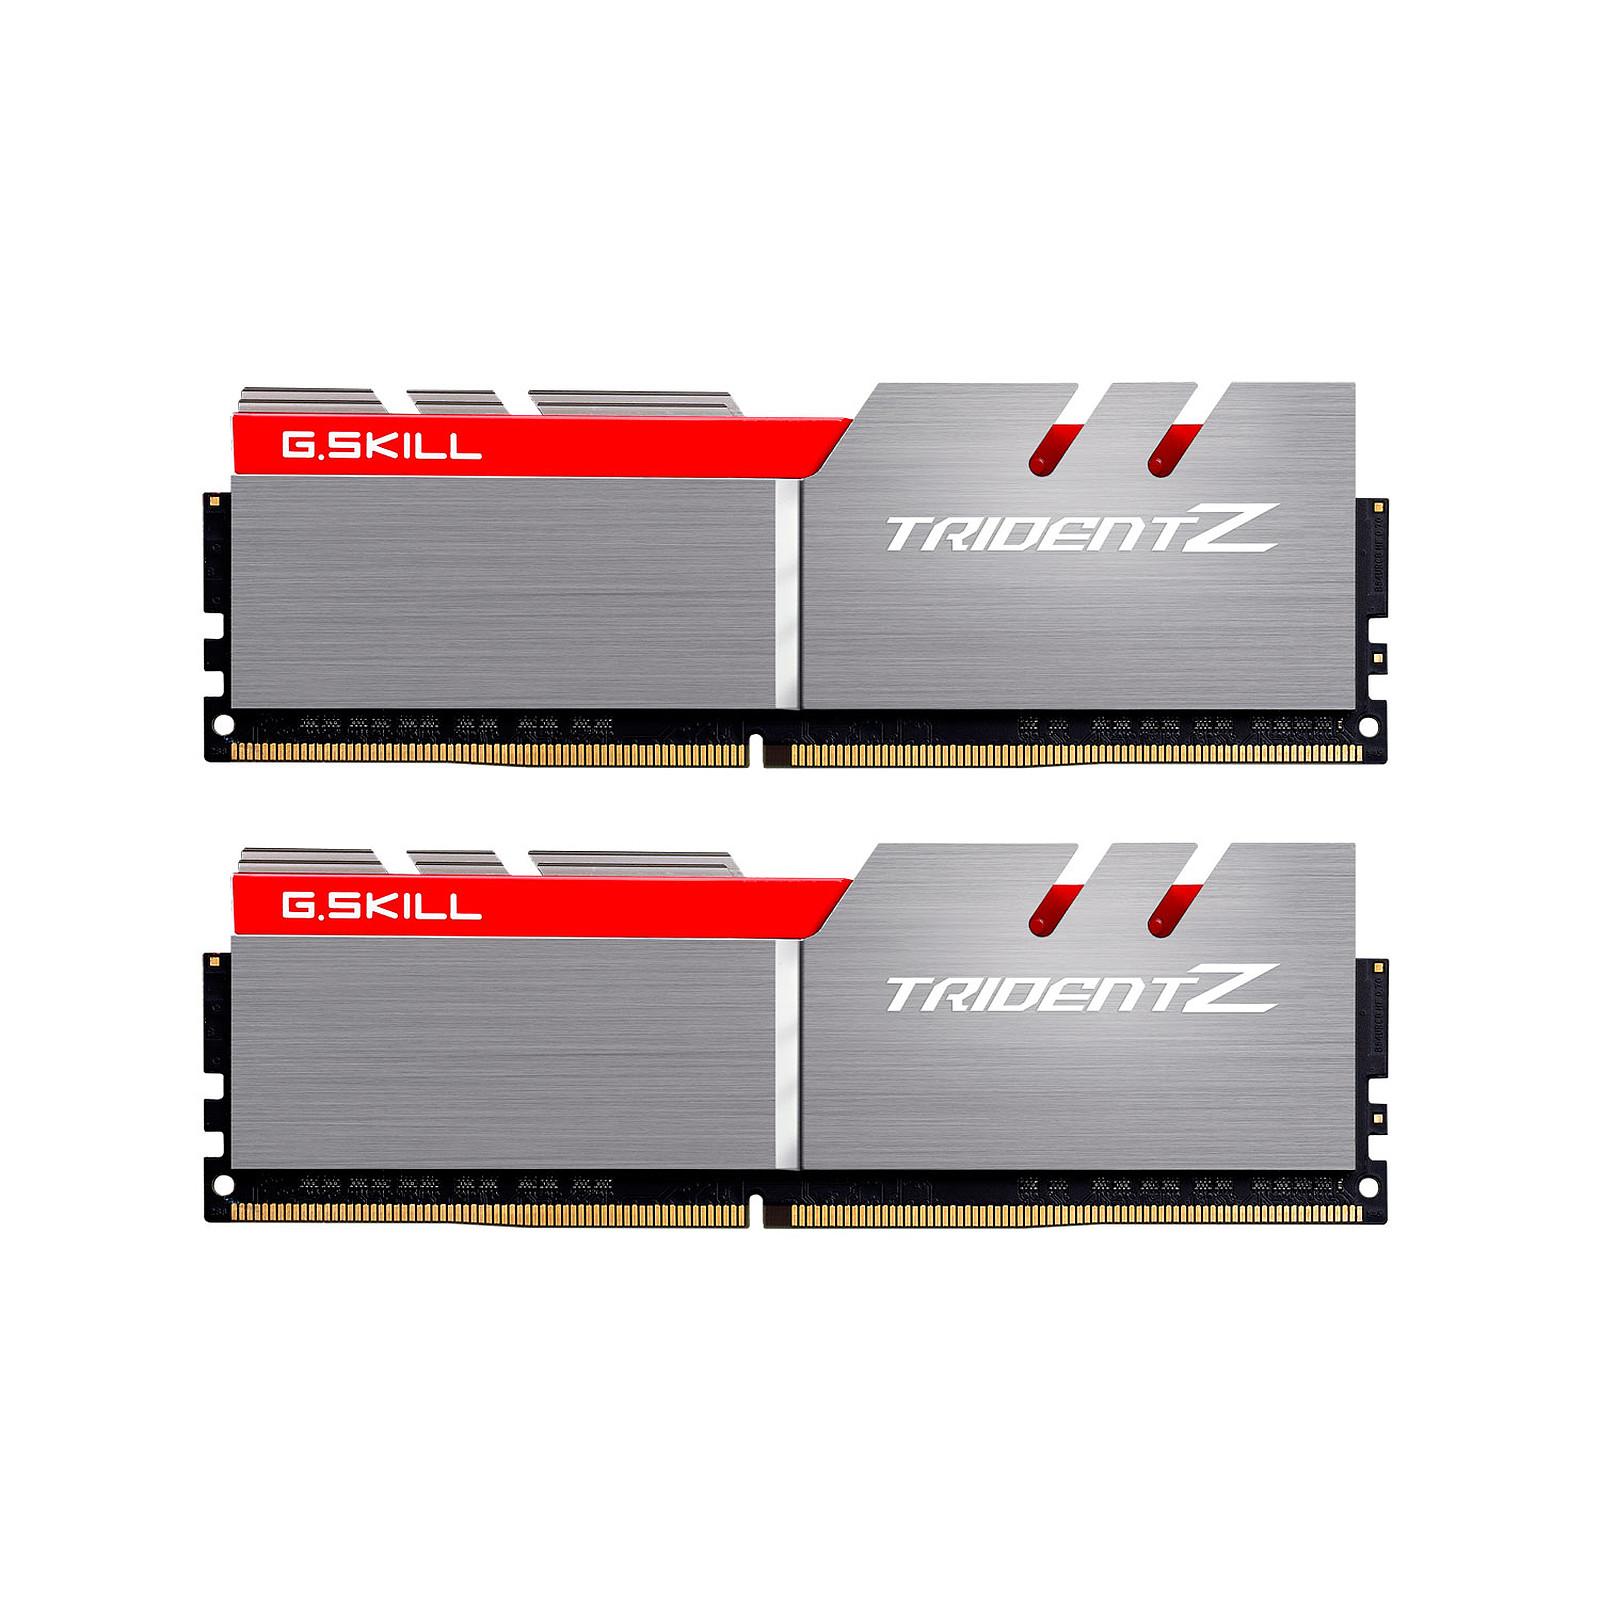 G.Skill Trident Z 32 Go (2x 16 Go) DDR4 3200 MHz CL14